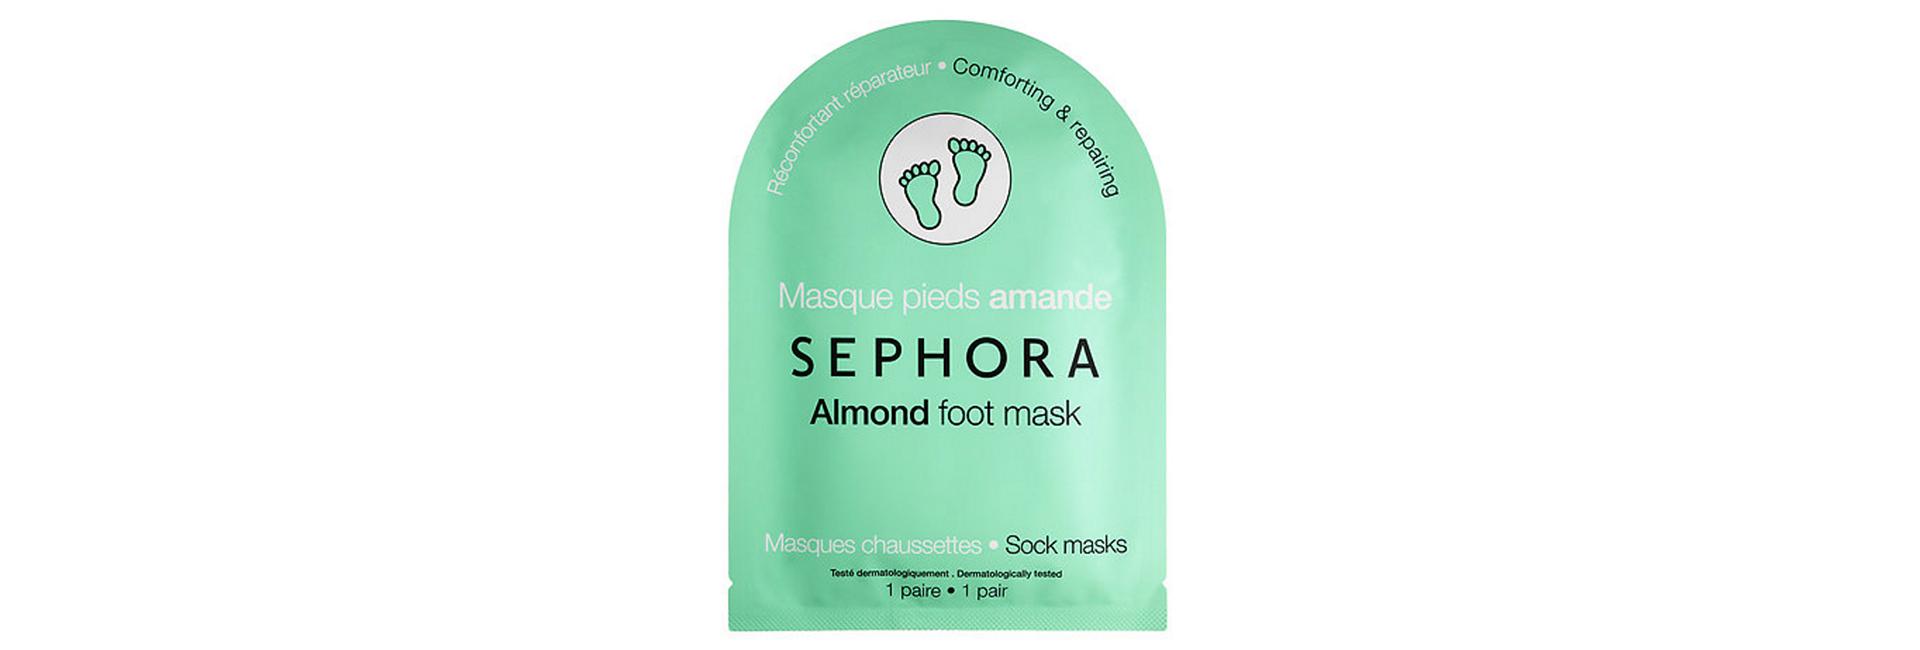 sephora-masque pieds-amande-blog-beaute-soin-parfum-homme